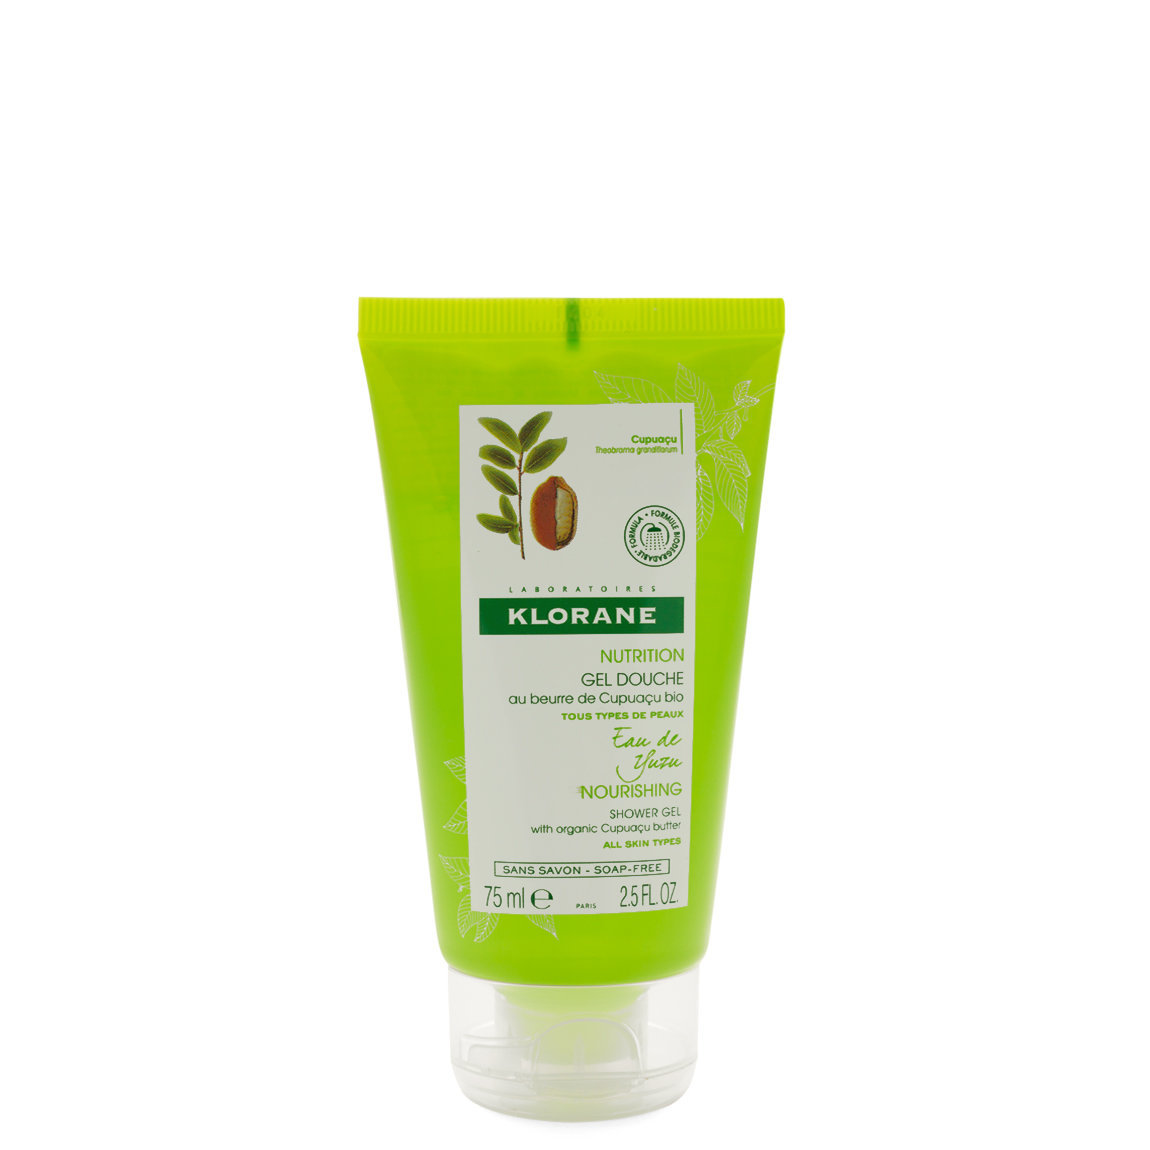 Klorane Yuzu Infusion Shower Gel with Cupuaçu Butter 2.5 fl oz alternative view 1 - product swatch.